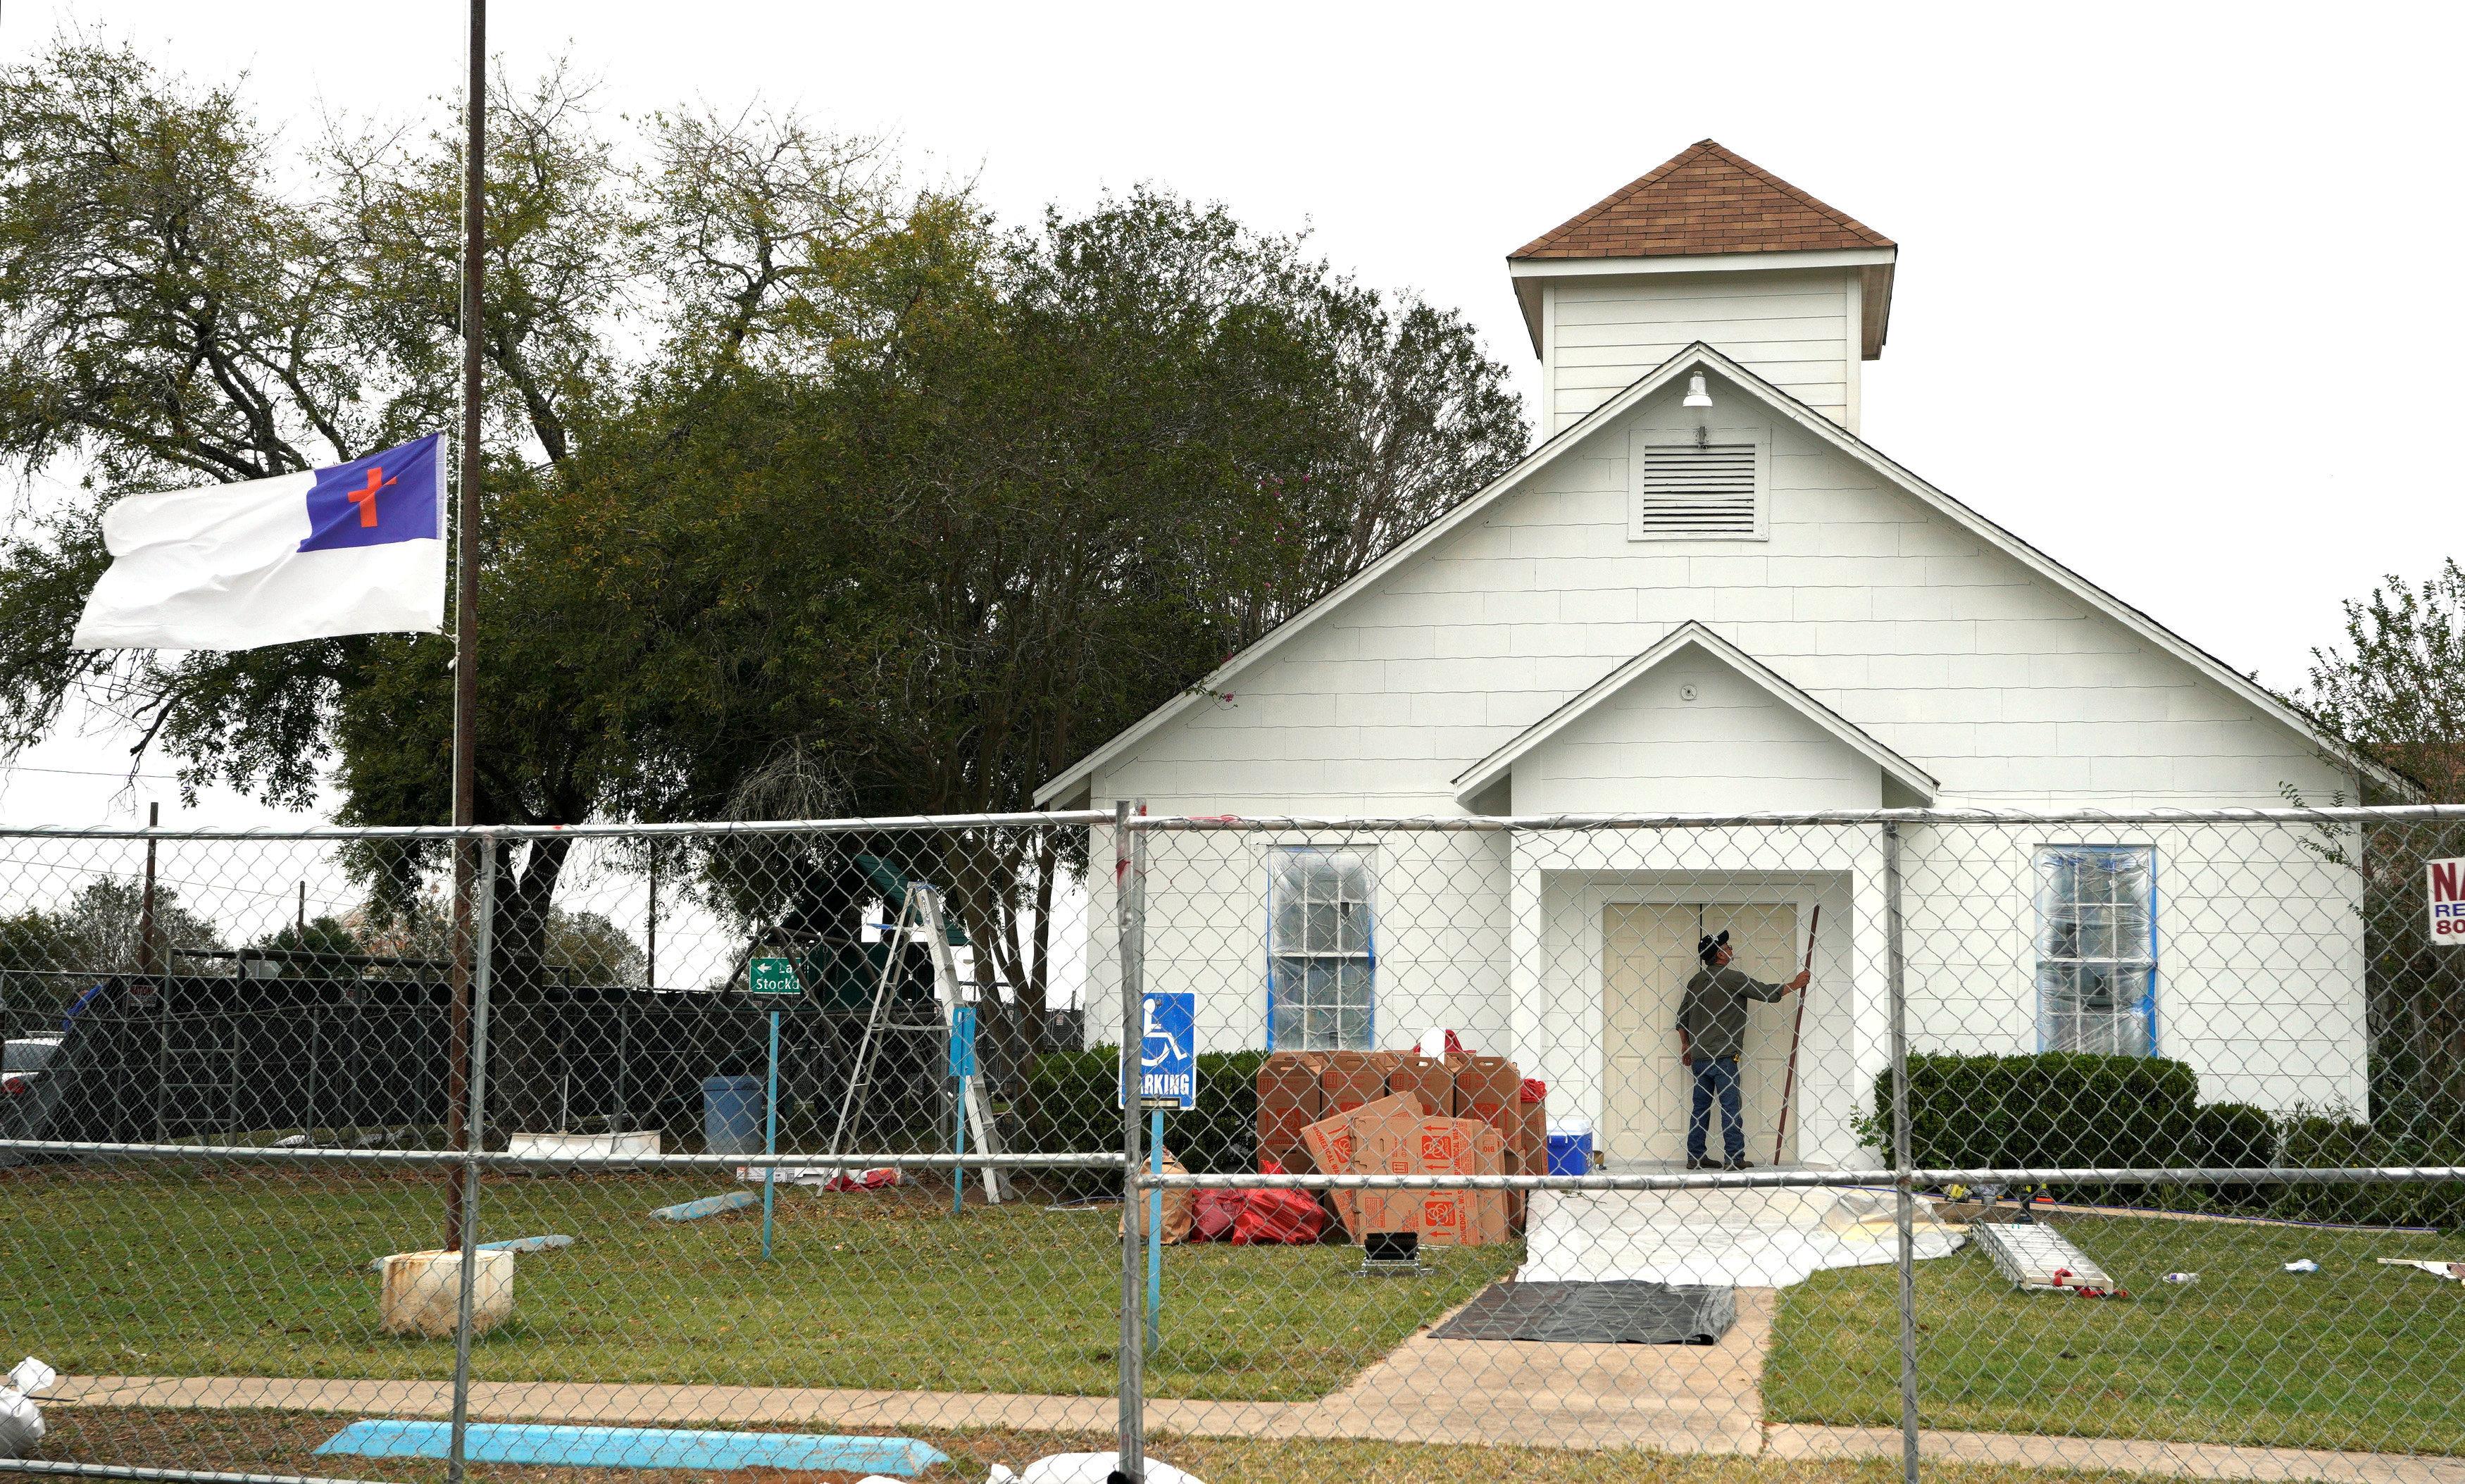 'My Heart Breaks': Tearful Worshippers Reunite A Week After Texas Church